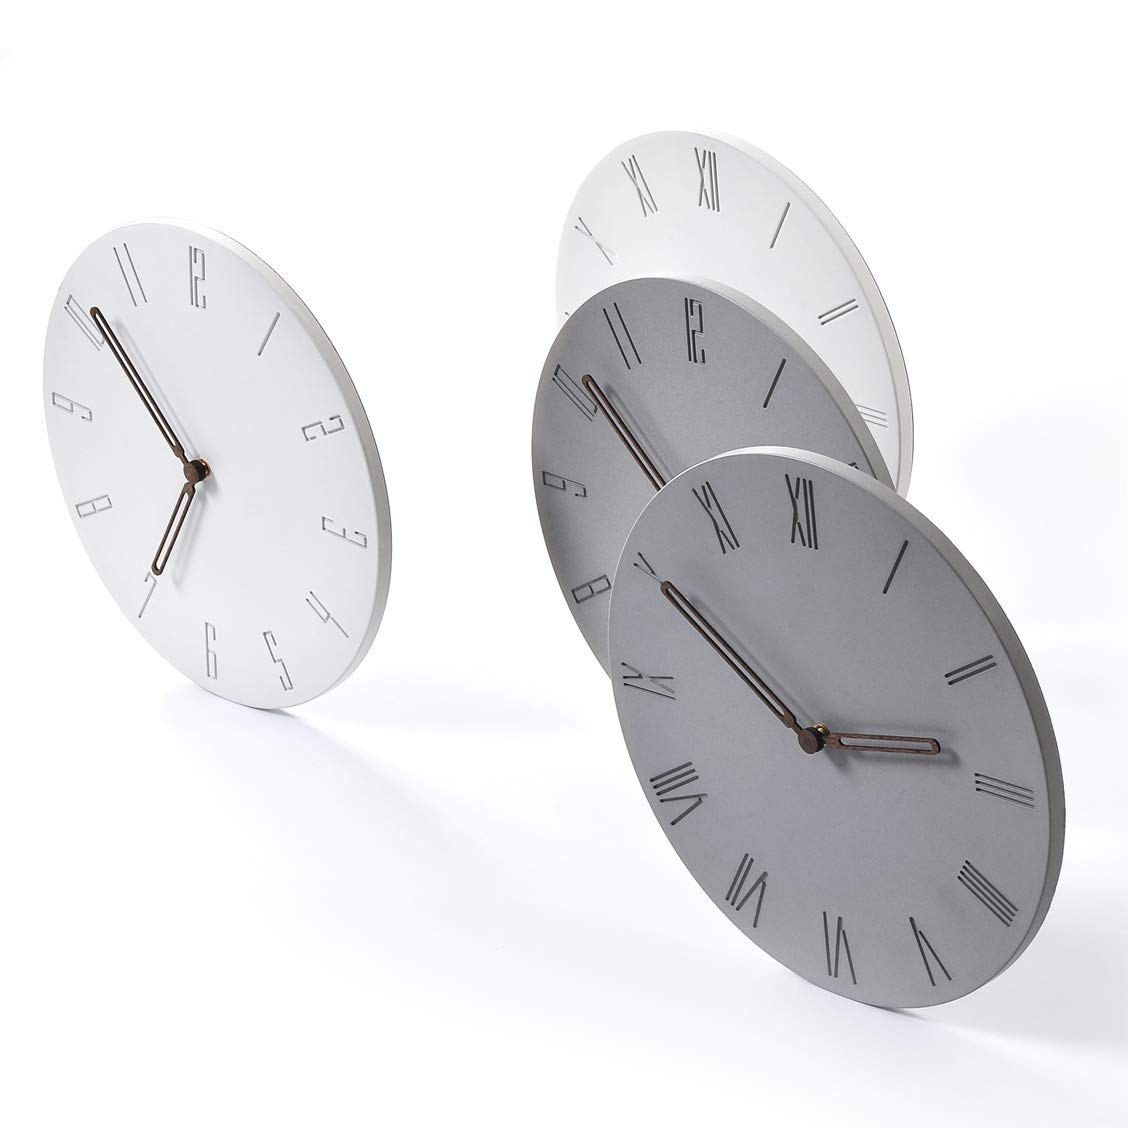 Amazon.com: Wallohere - Reloj de pared silencioso, no se ...